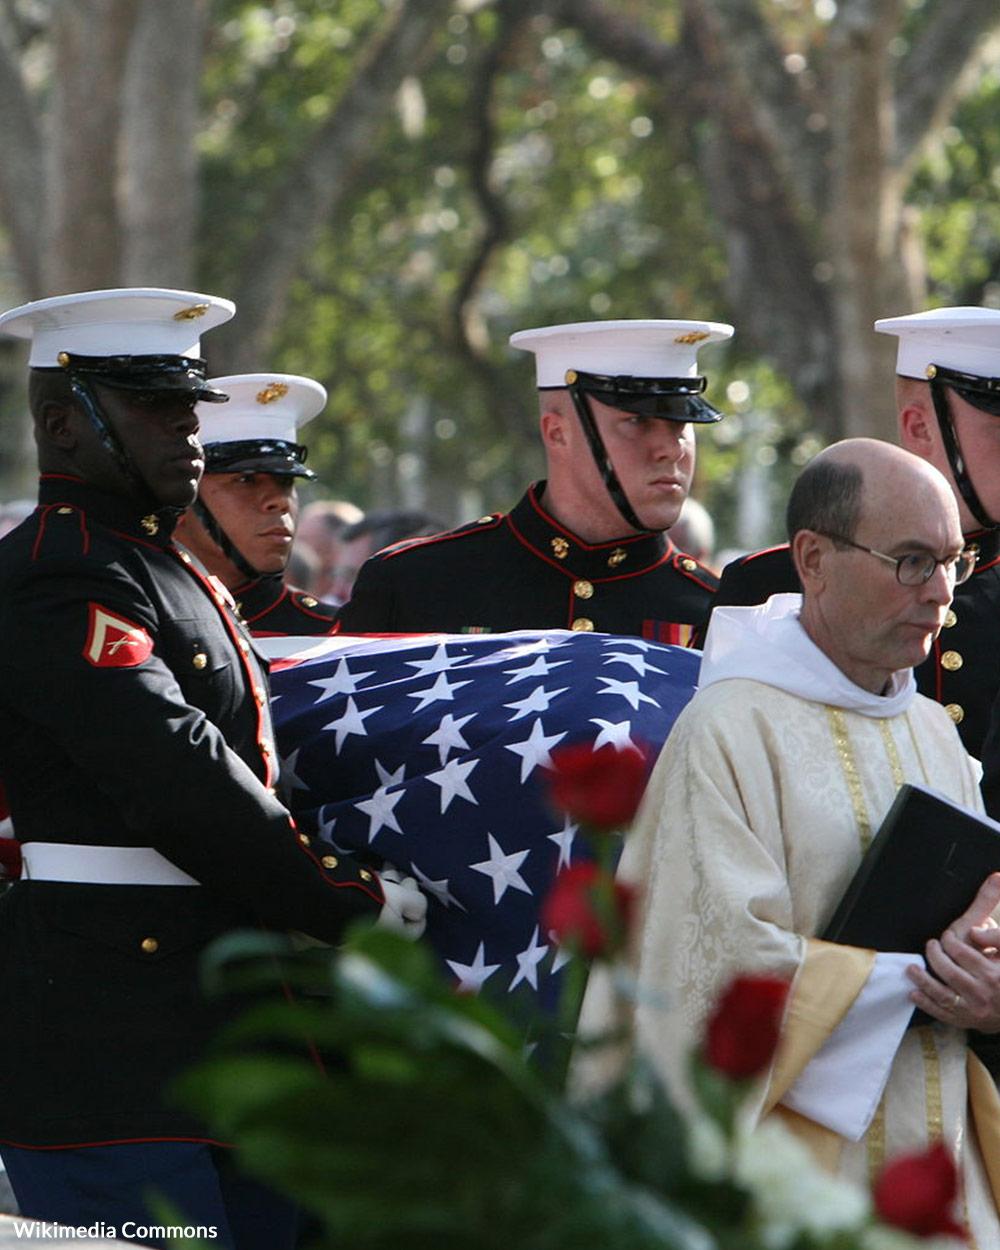 U.S. Marine Body Bearers have a very special job.